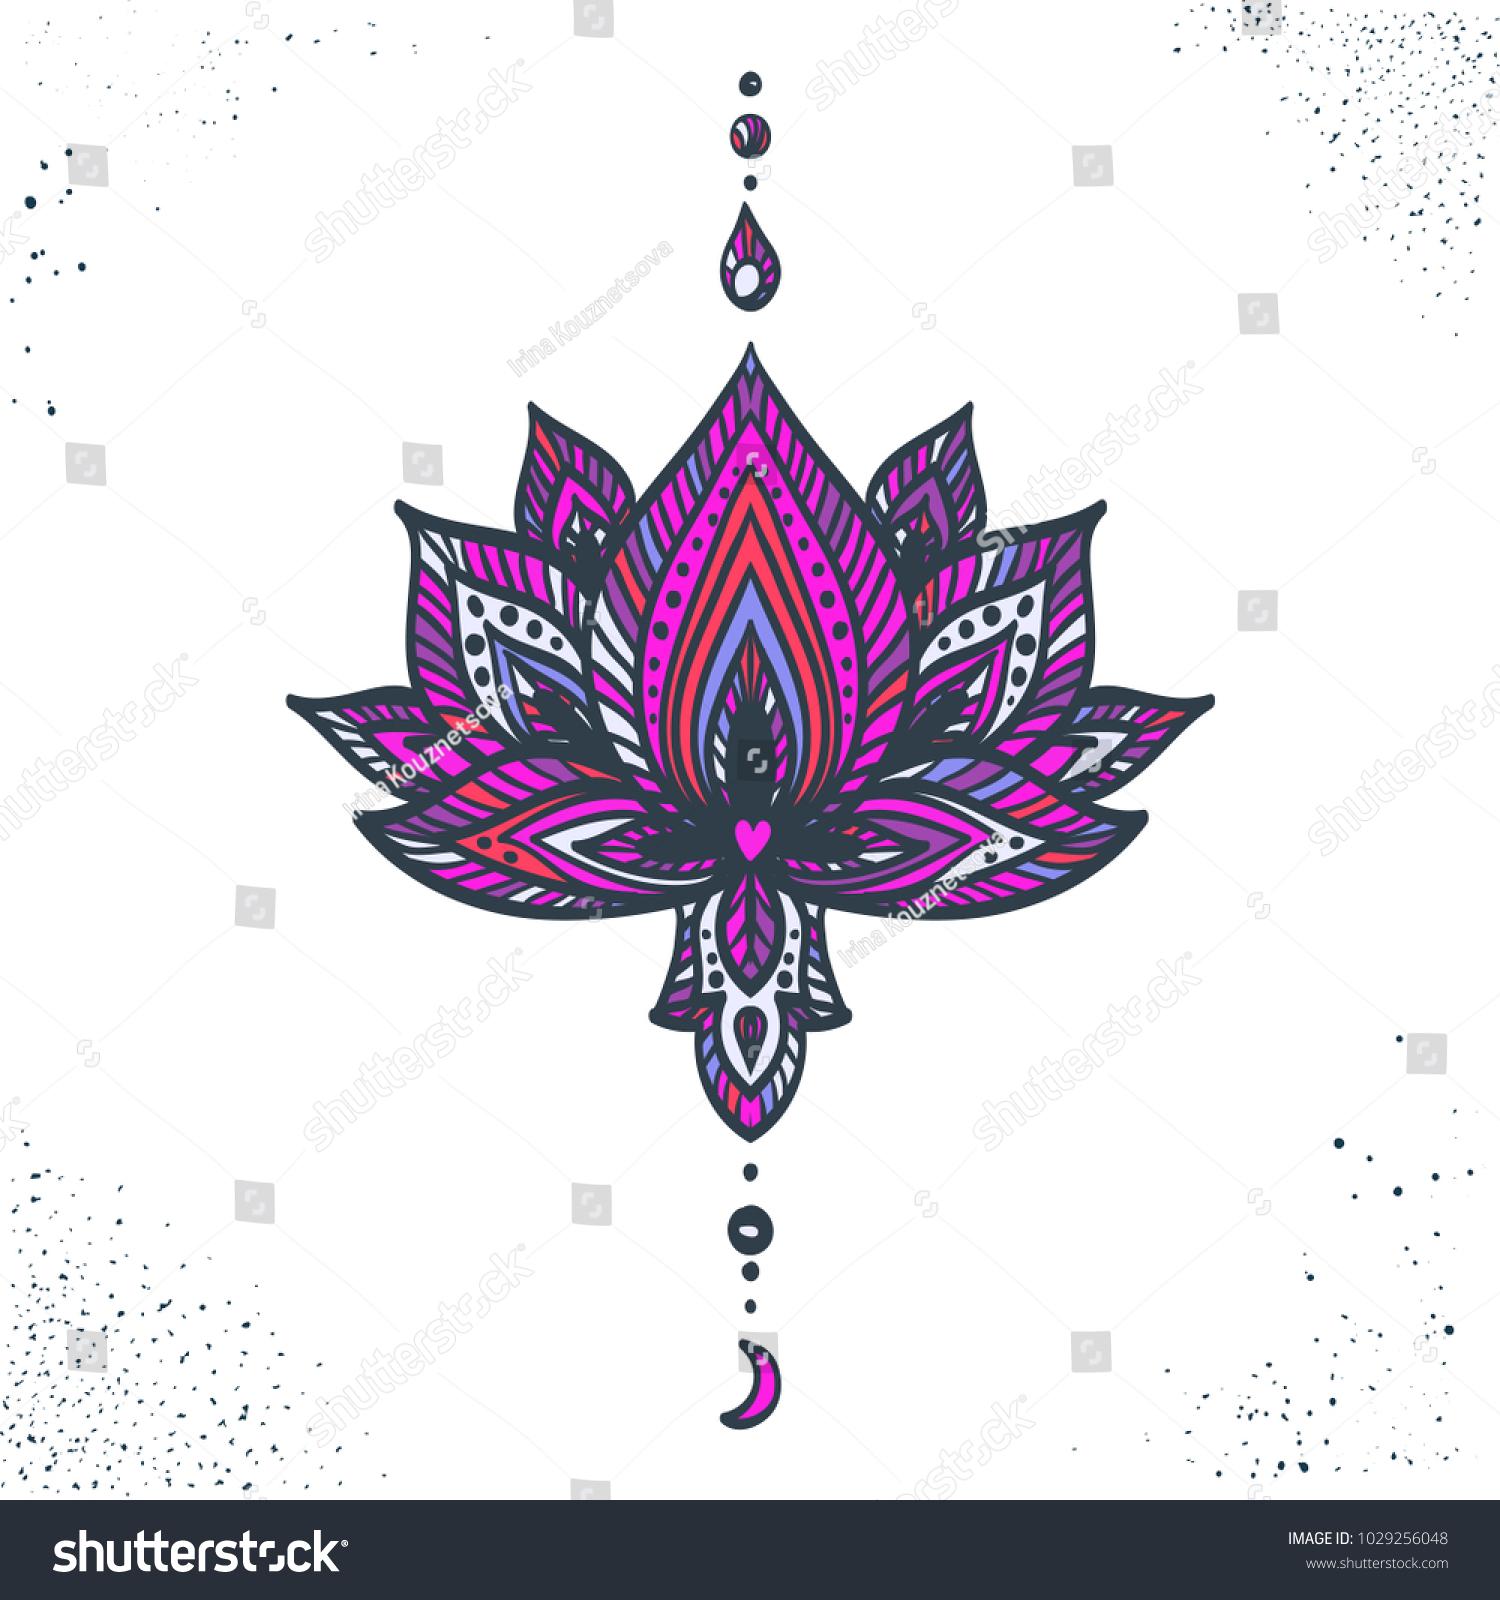 Vector ornamental lotus flower hand drawn stock vector royalty free vector ornamental lotus flower hand drawn ethnic illustration tattoo astrology alchemy izmirmasajfo